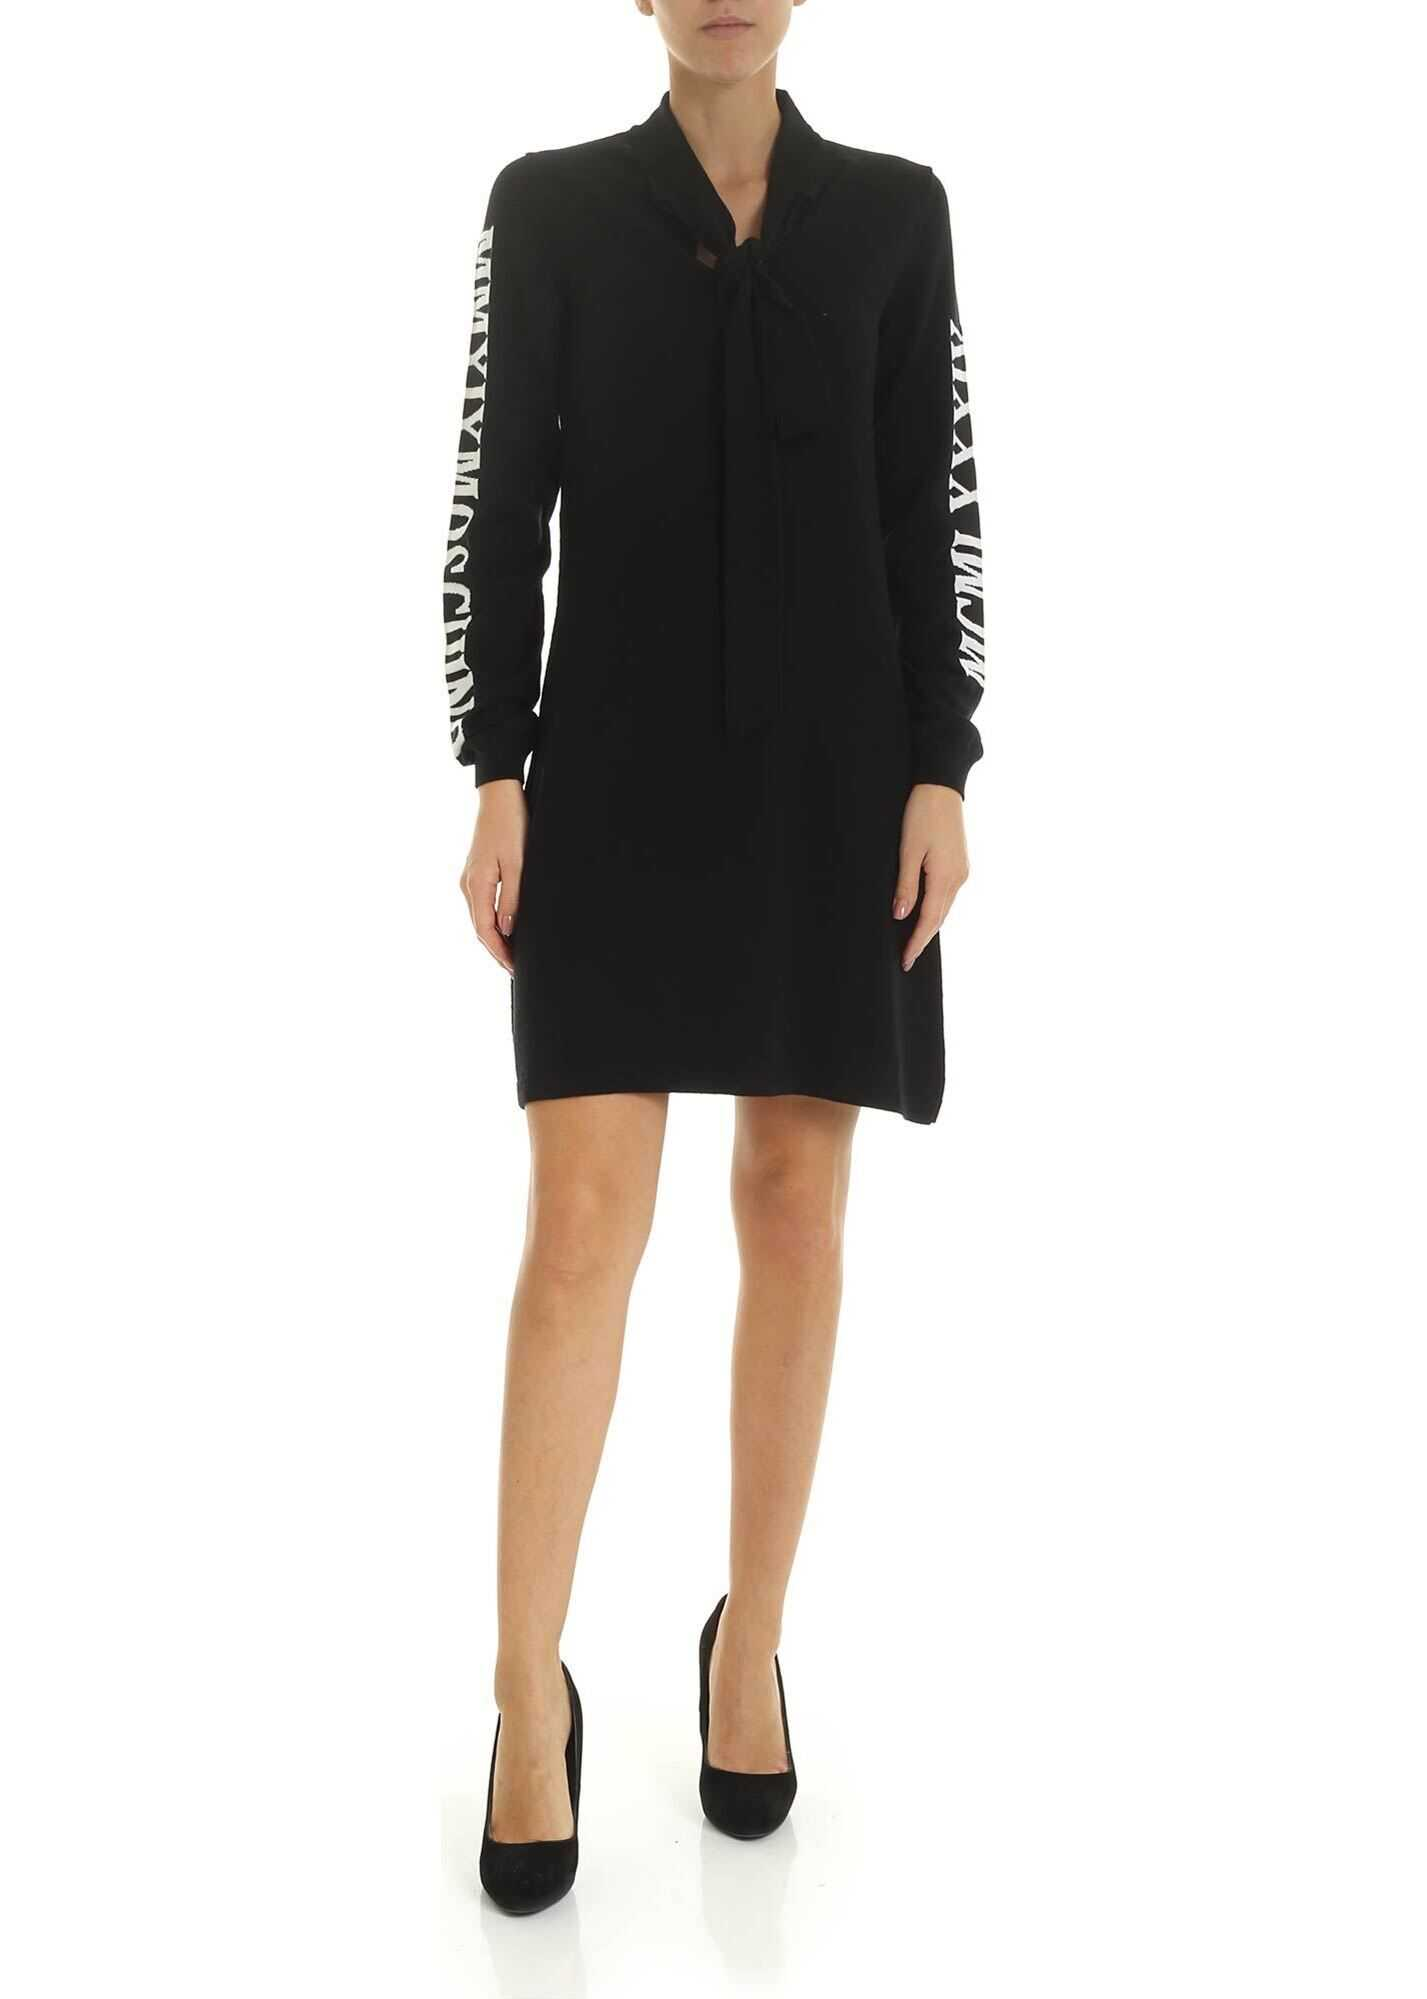 Moschino Moschino Milano Embroidery Dress In Black Black